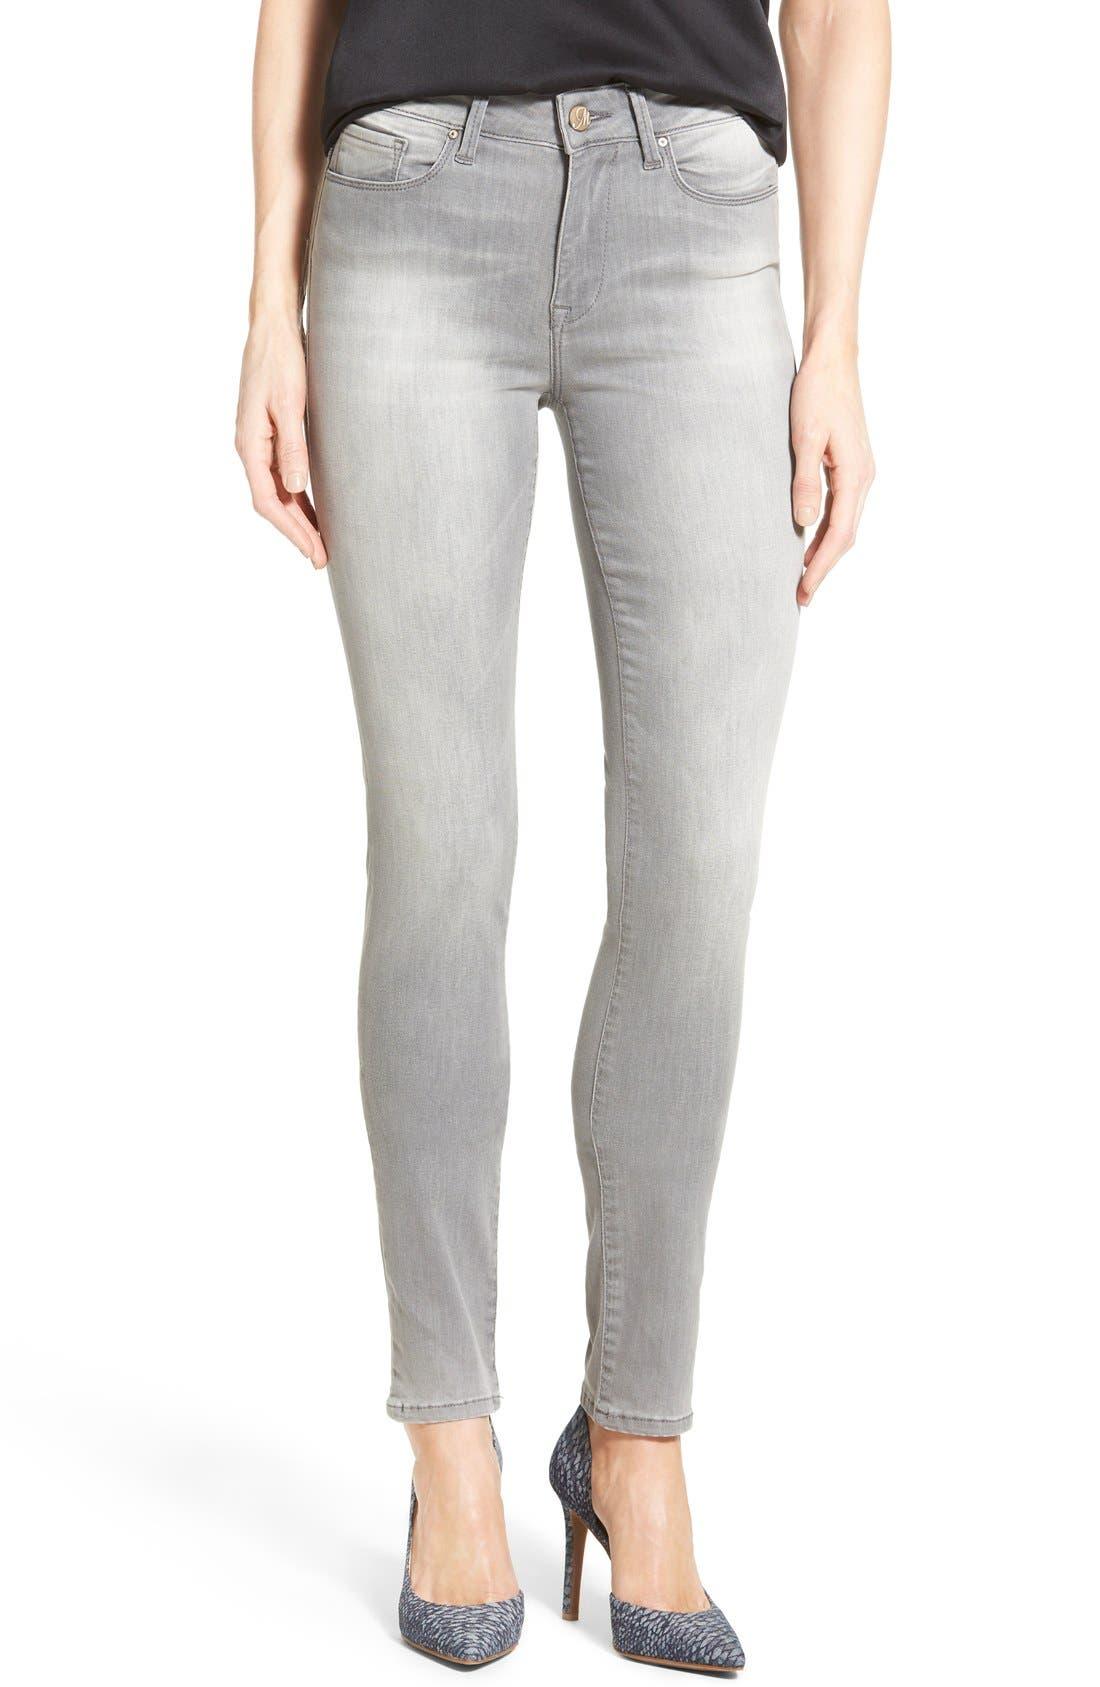 Main Image - Mavi Jeans 'Alissa' Stretch Skinny Jeans (Light Grey Tribeca) (Petite)